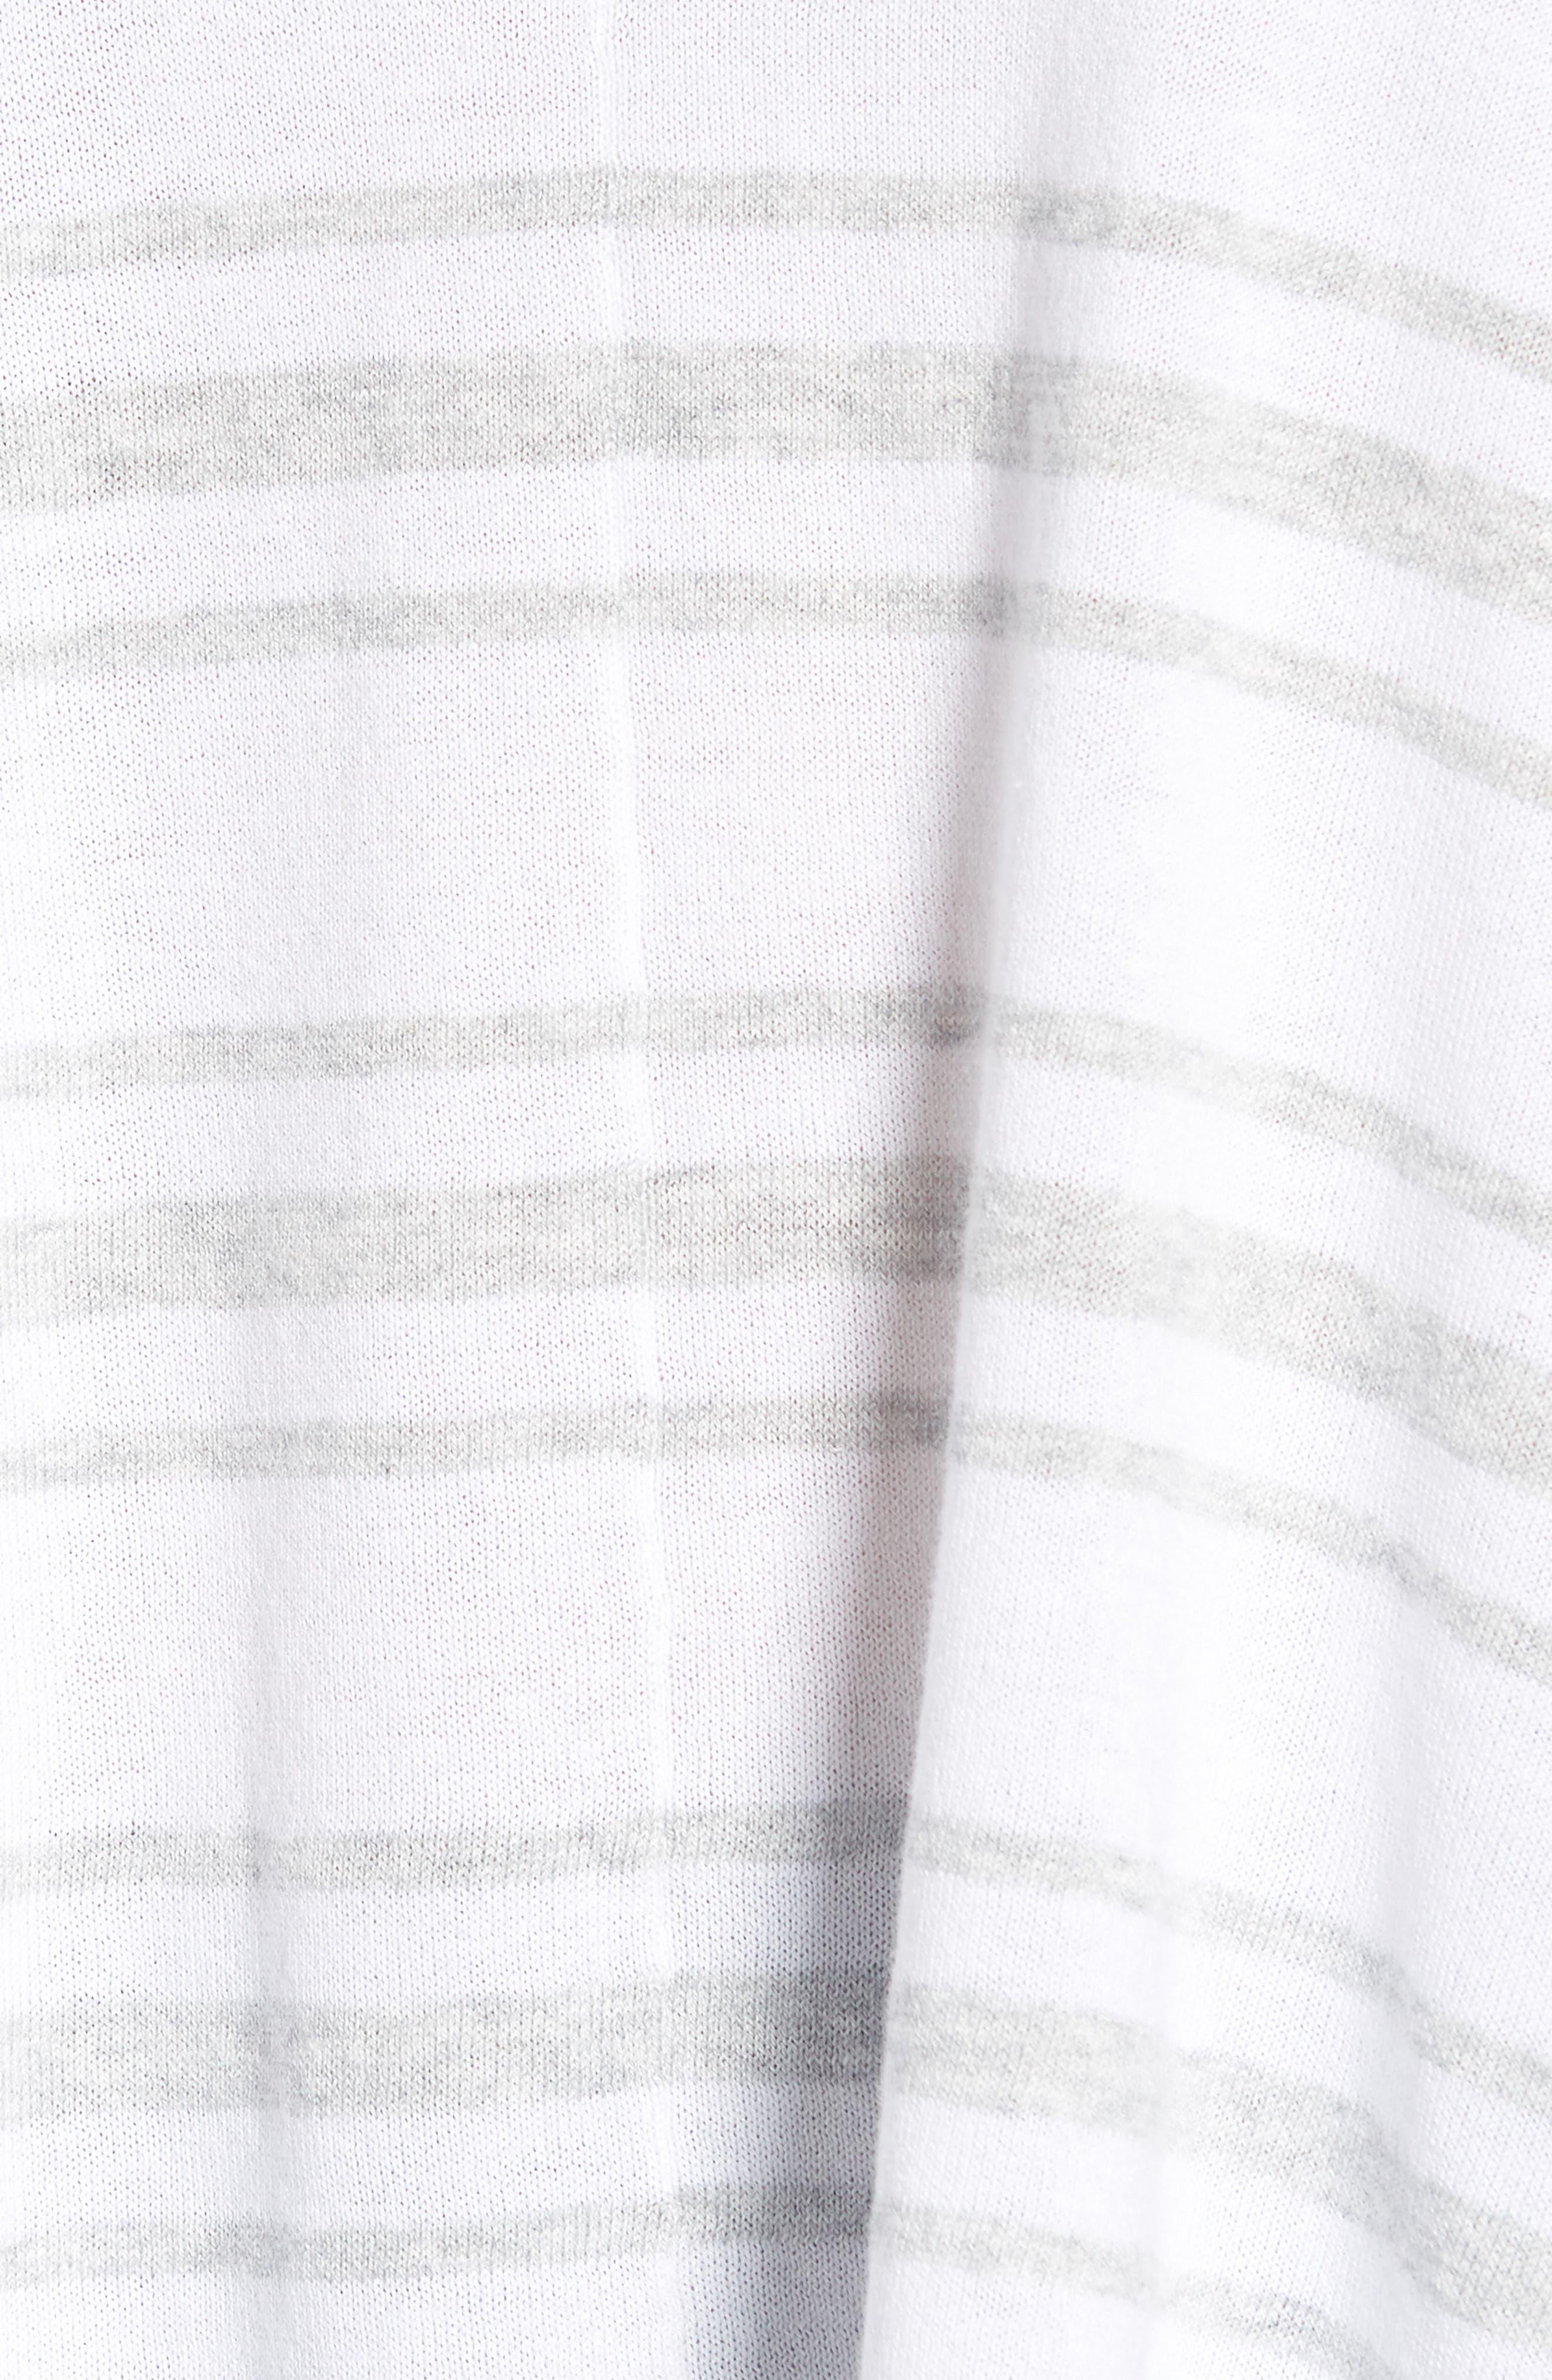 Oversize Sleeve Stripe V-Neck Sweater,                             Alternate thumbnail 6, color,                             Warm White Pebble Grey Mix